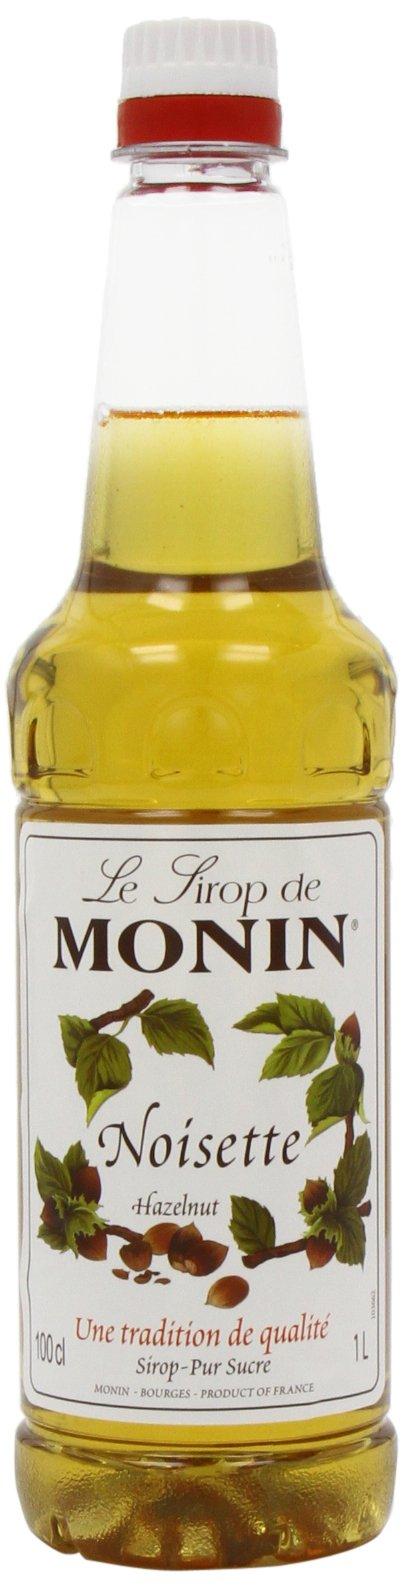 Monin-Premium-Hazelnut-Syrup-1-L